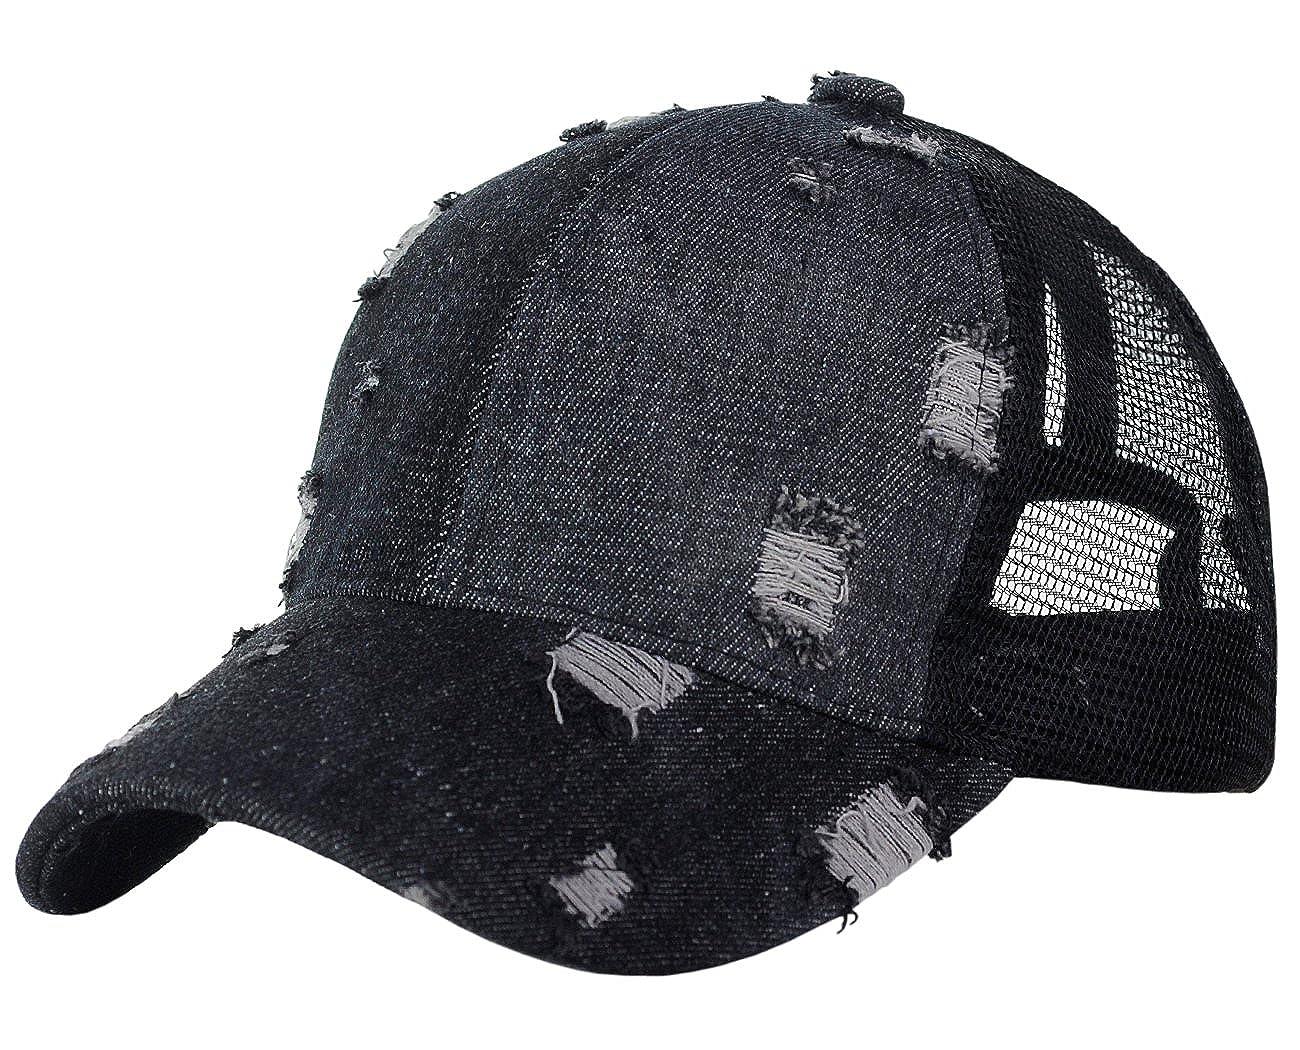 32eae00ed91 C.C Ponycap Messy High Bun Ponytail Distressed Vintage Mesh Trucker  Baseball Cap Black BT8-BK